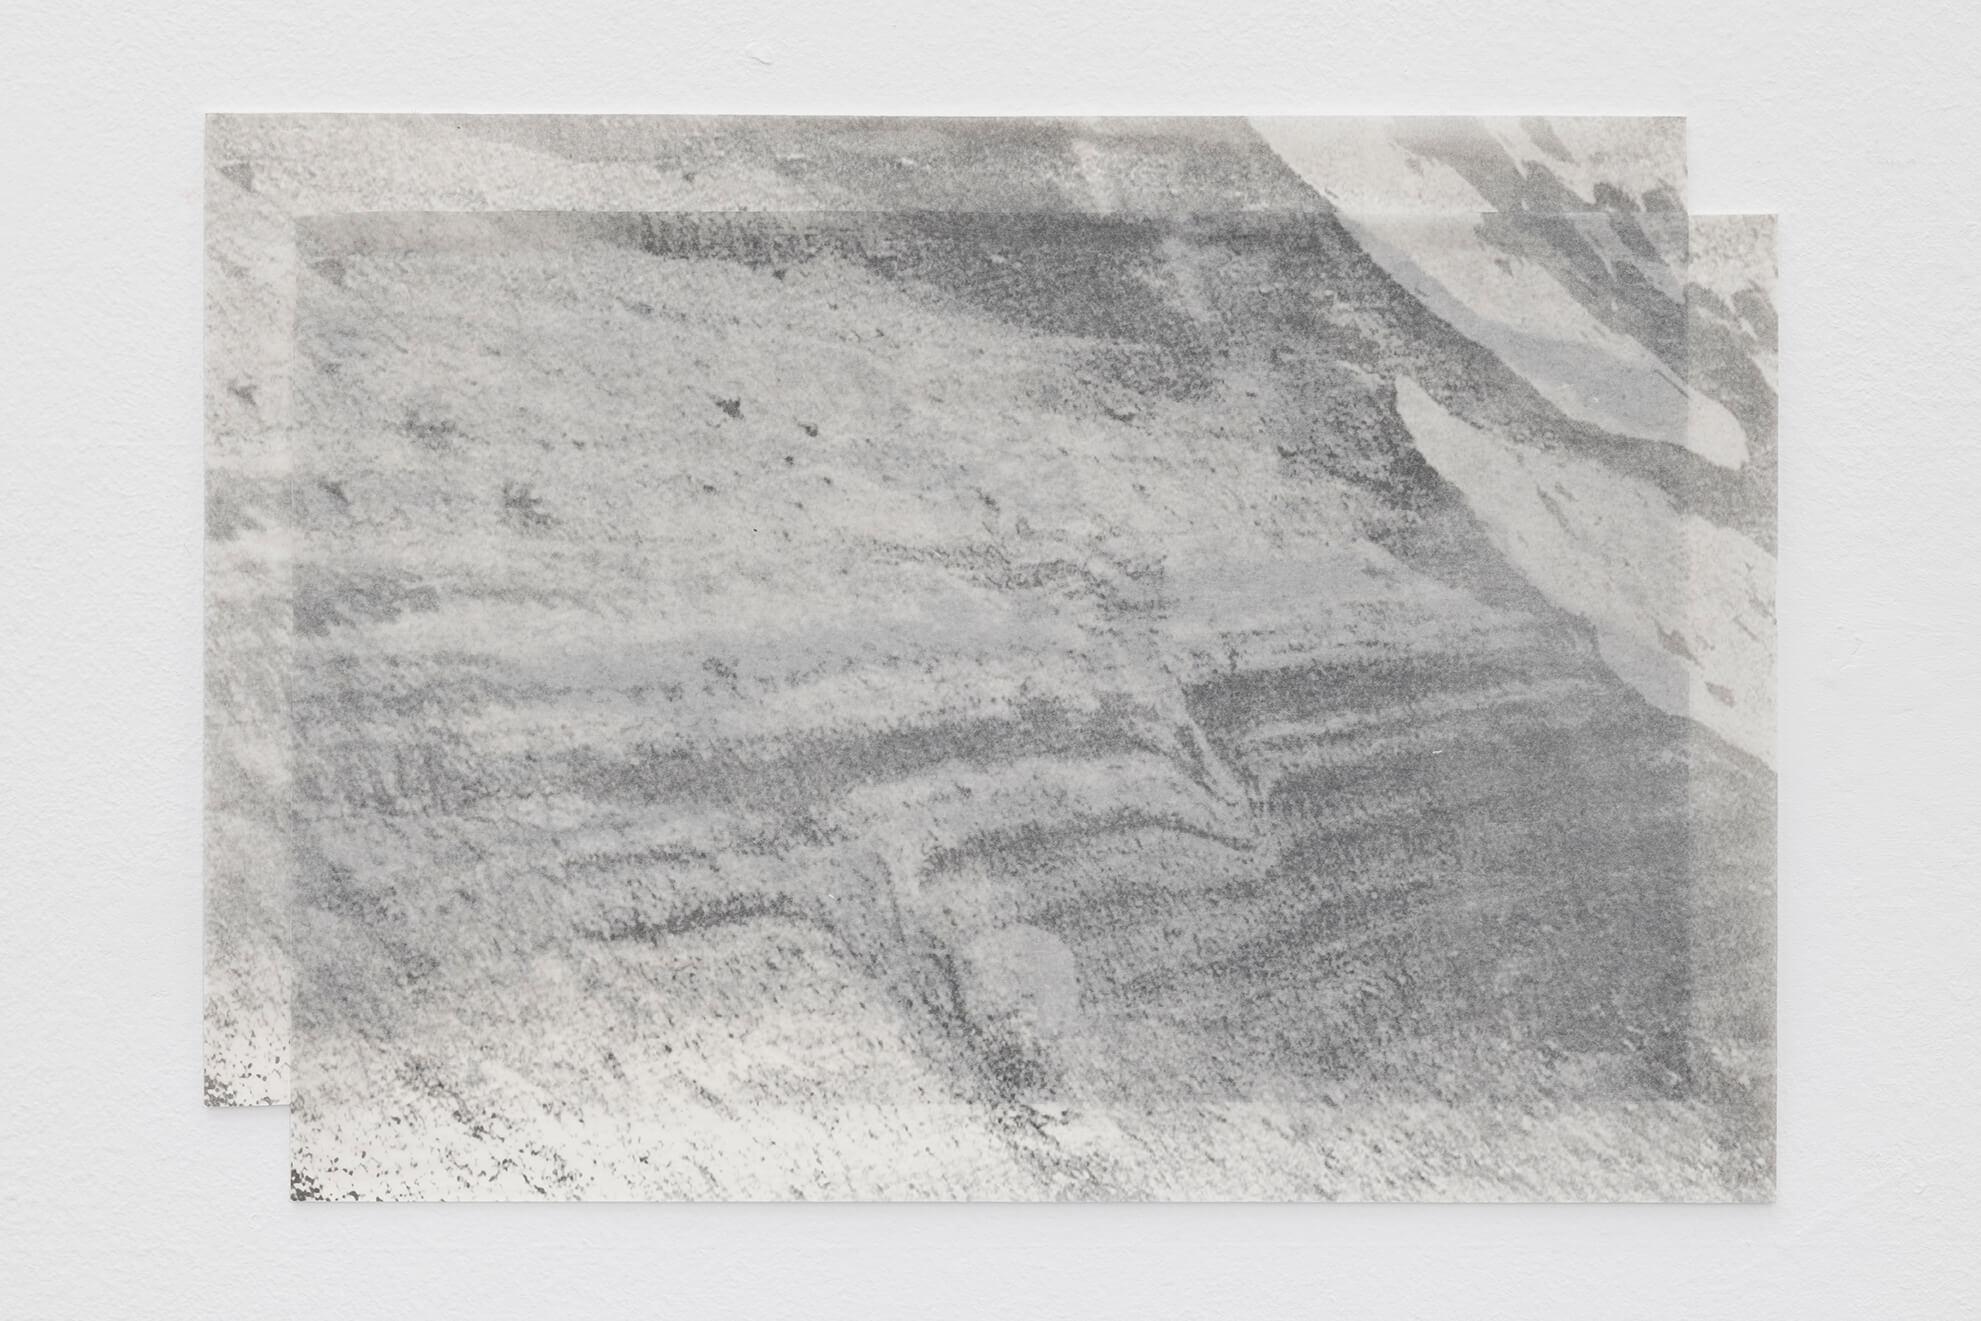 PATRICIA DAUDER.Mount & Landslide, 2020. (Detail) | El Museu Imaginari / El Museo Imaginario / The Imaginary Museum | ProjecteSD